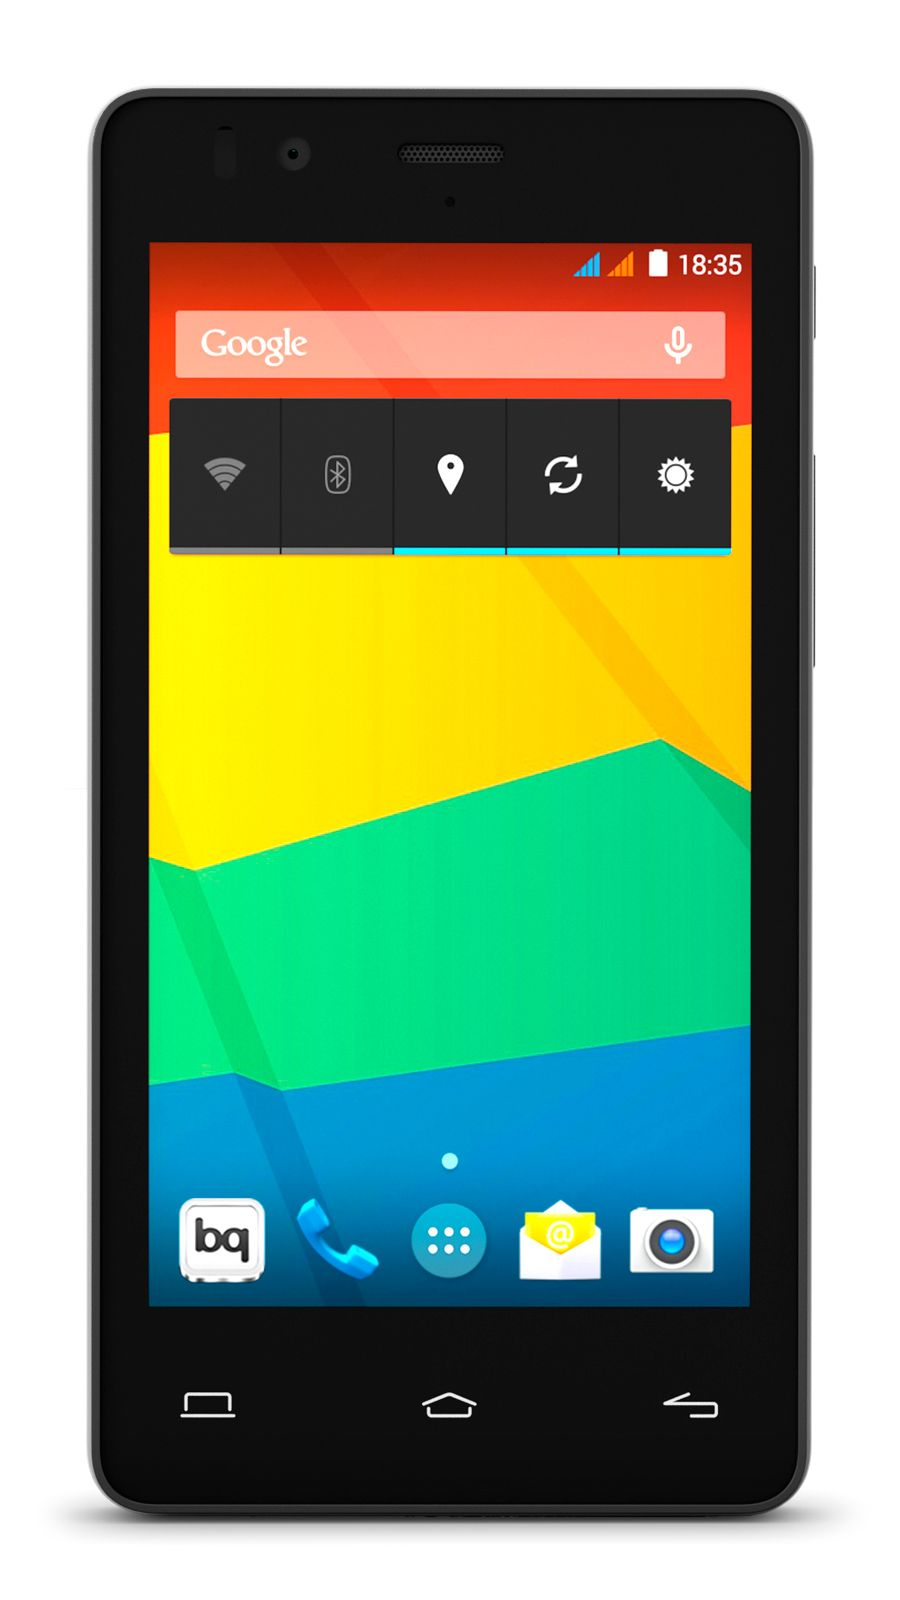 Pn 03bqaqu30 Smartphone Bq Aquaris E4 5 Black 4 5 Quadcore 1gb 8gb